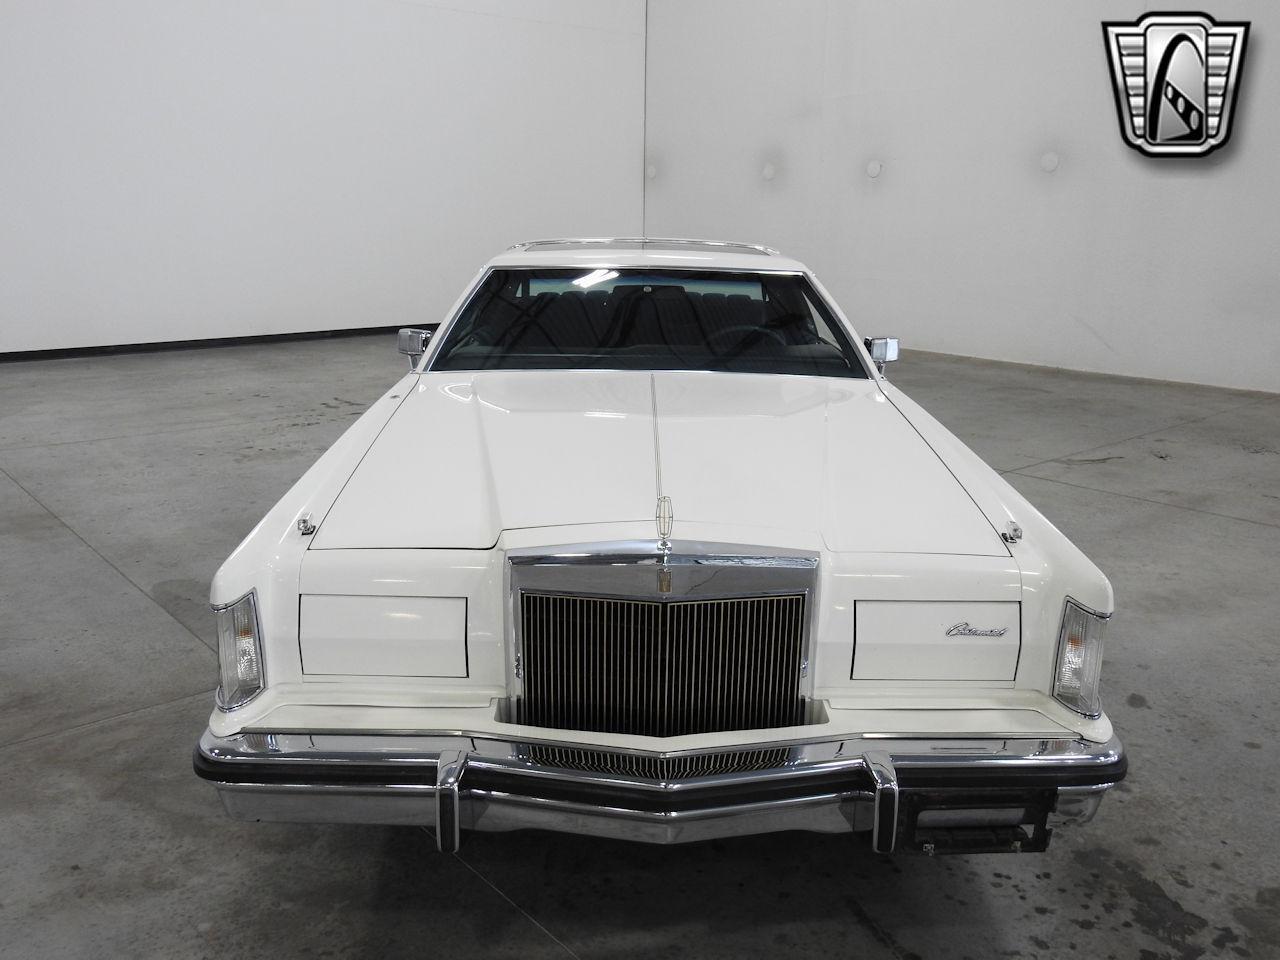 1979 Lincoln MKV 2